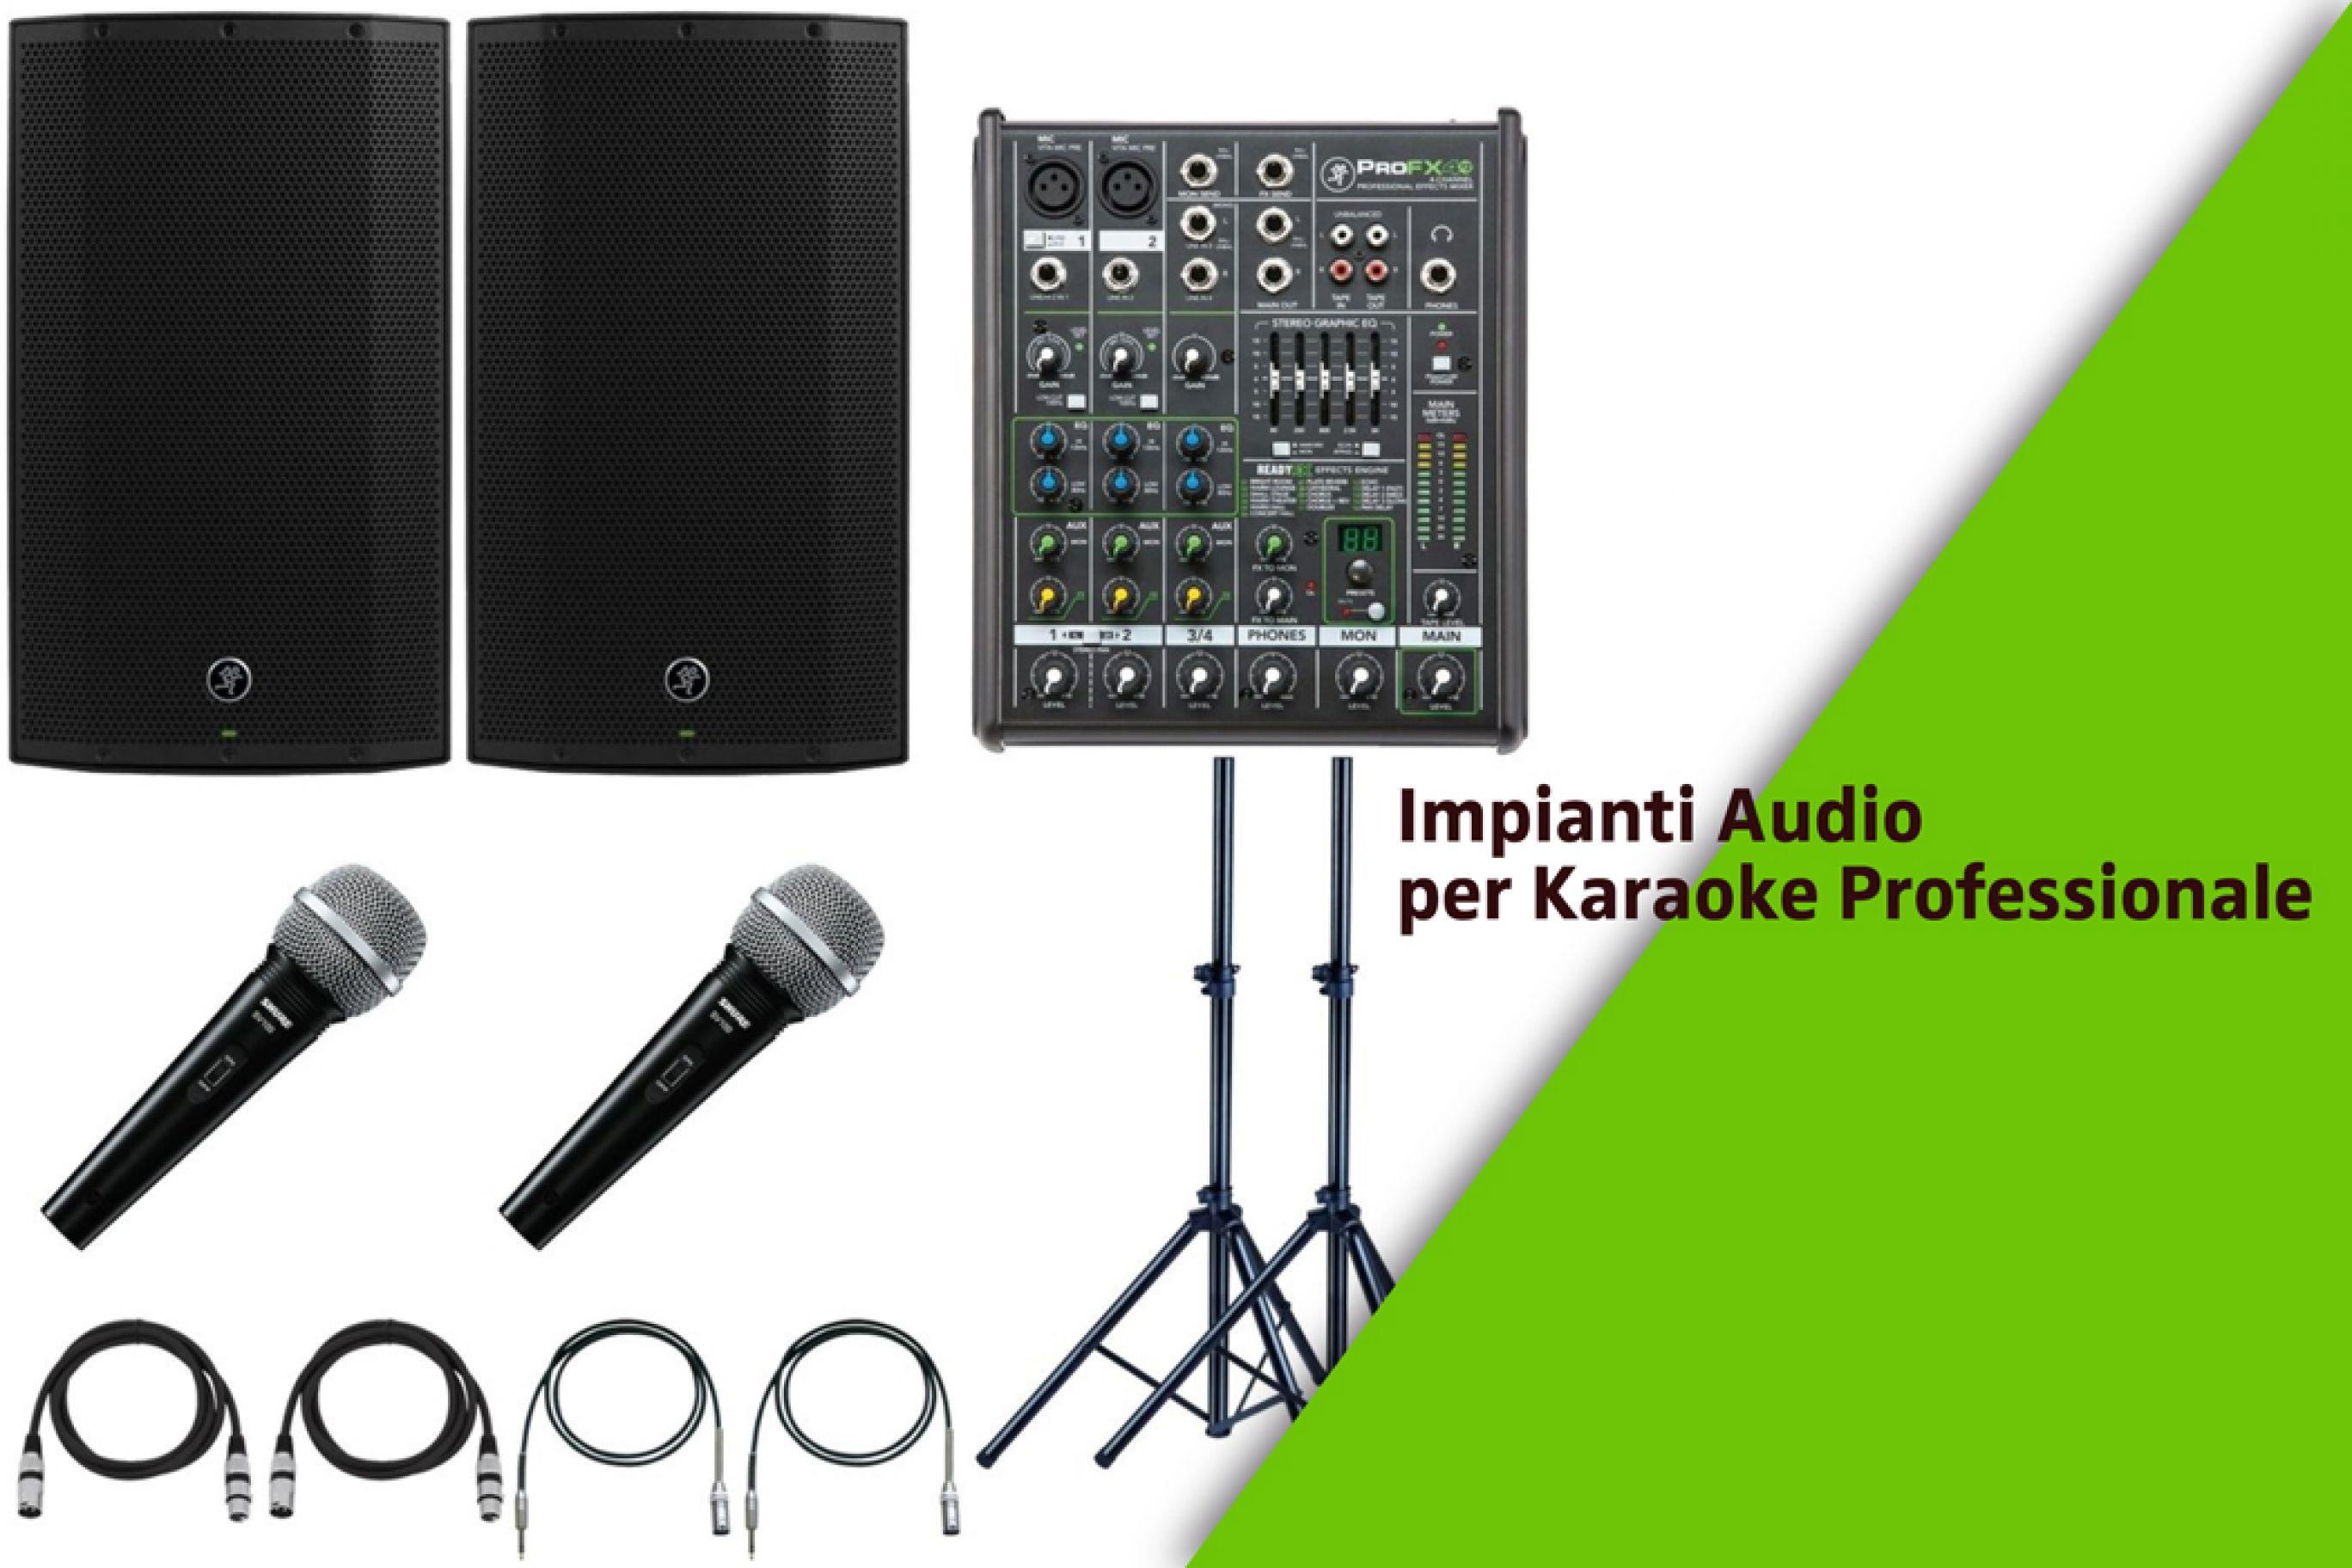 Impianto Karaoke Professionale